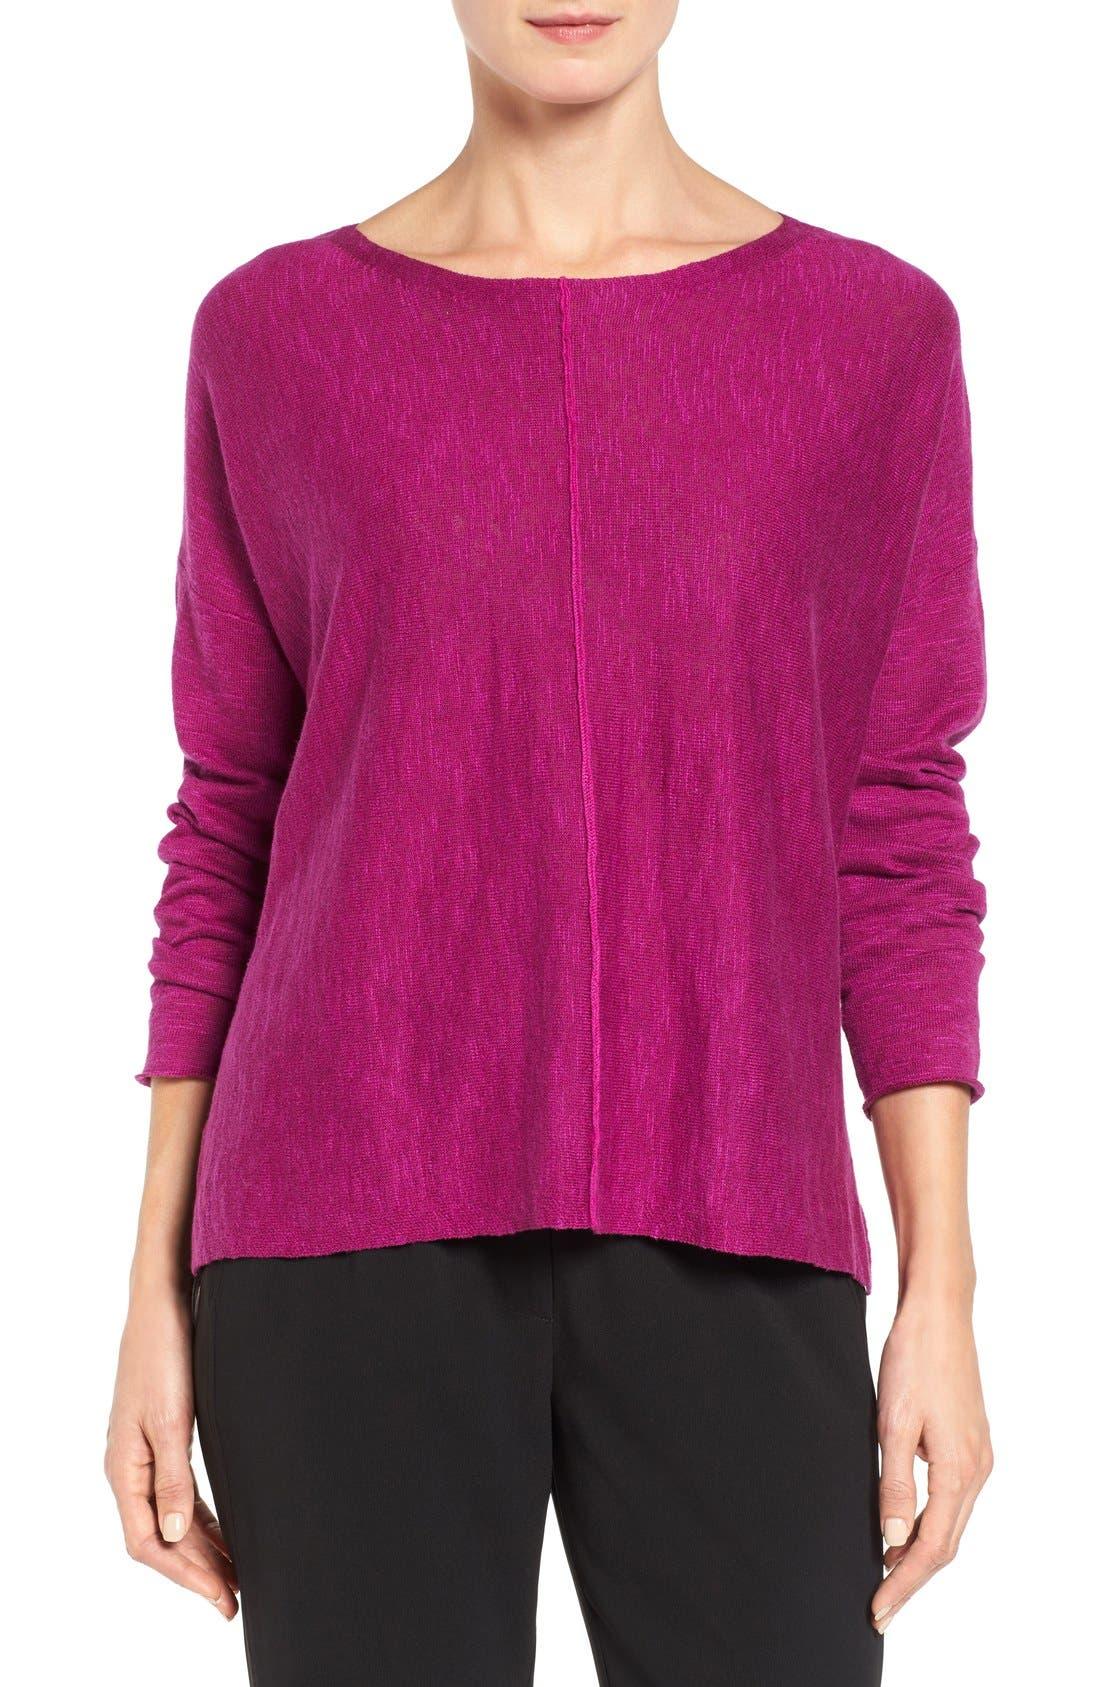 Main Image - Eileen Fisher Organic Linen & Cotton Top (Regular & Petite)